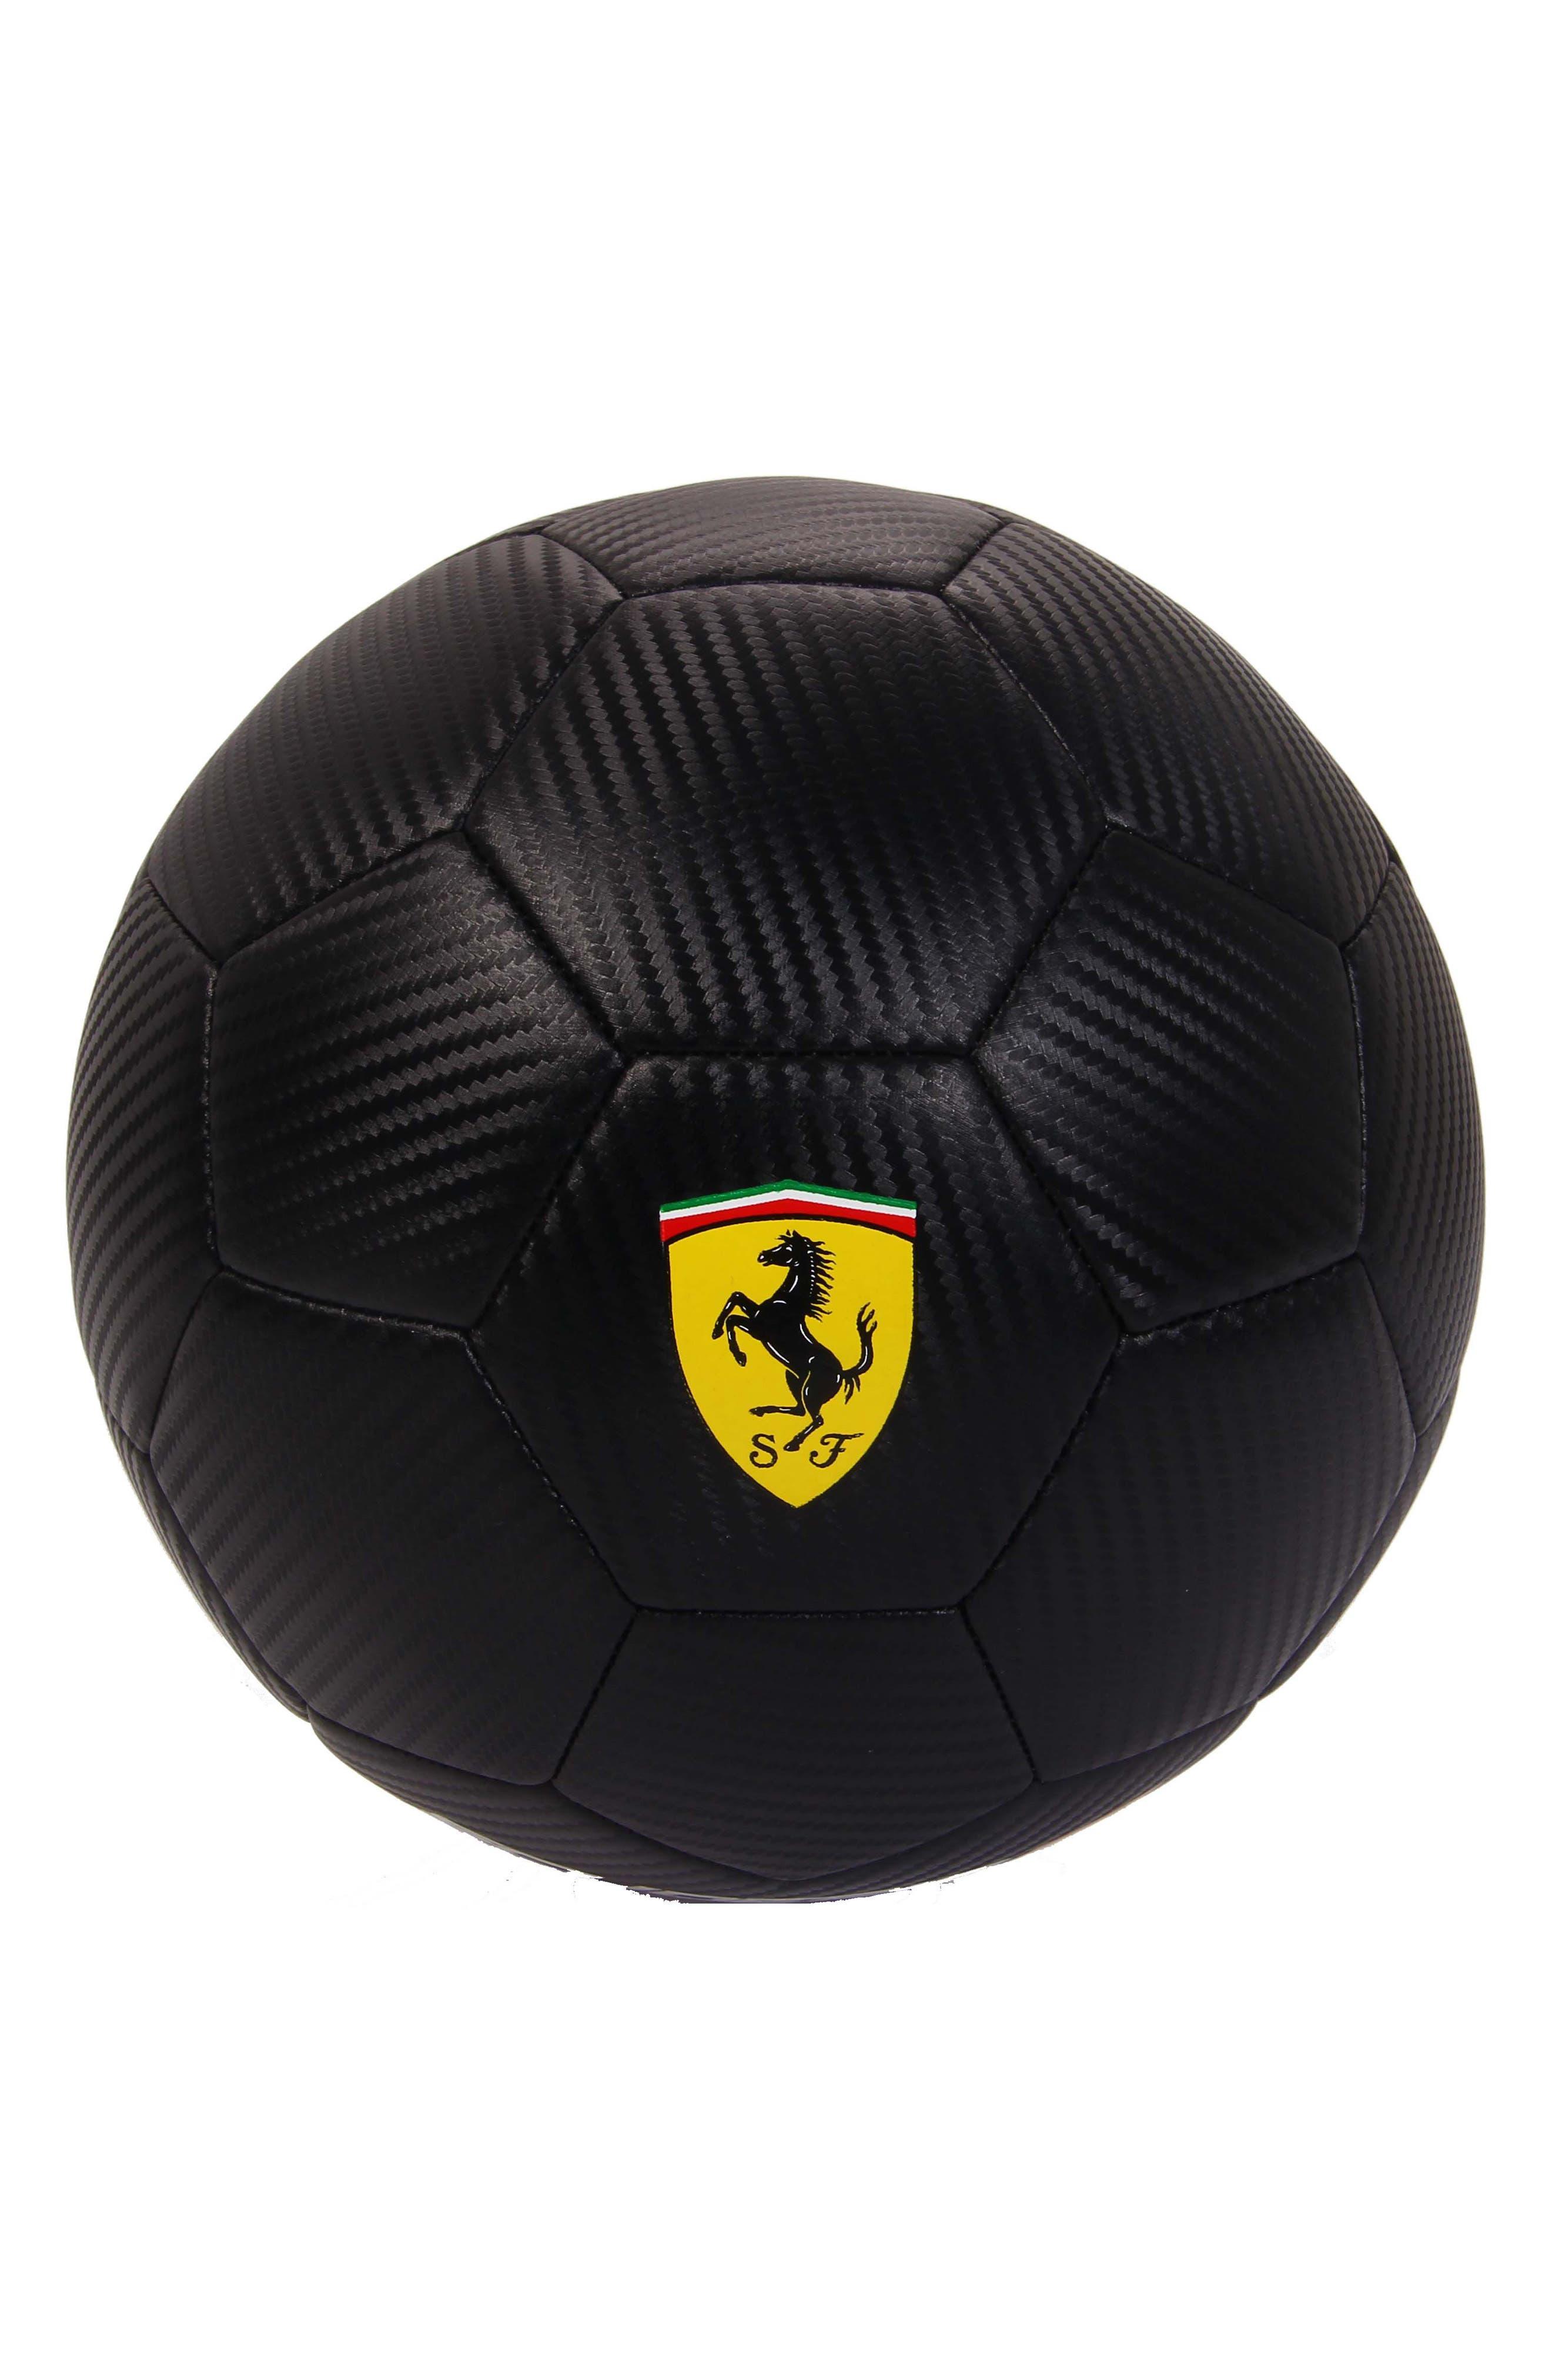 Size 5 Soccer Ball,                         Main,                         color, BLACK